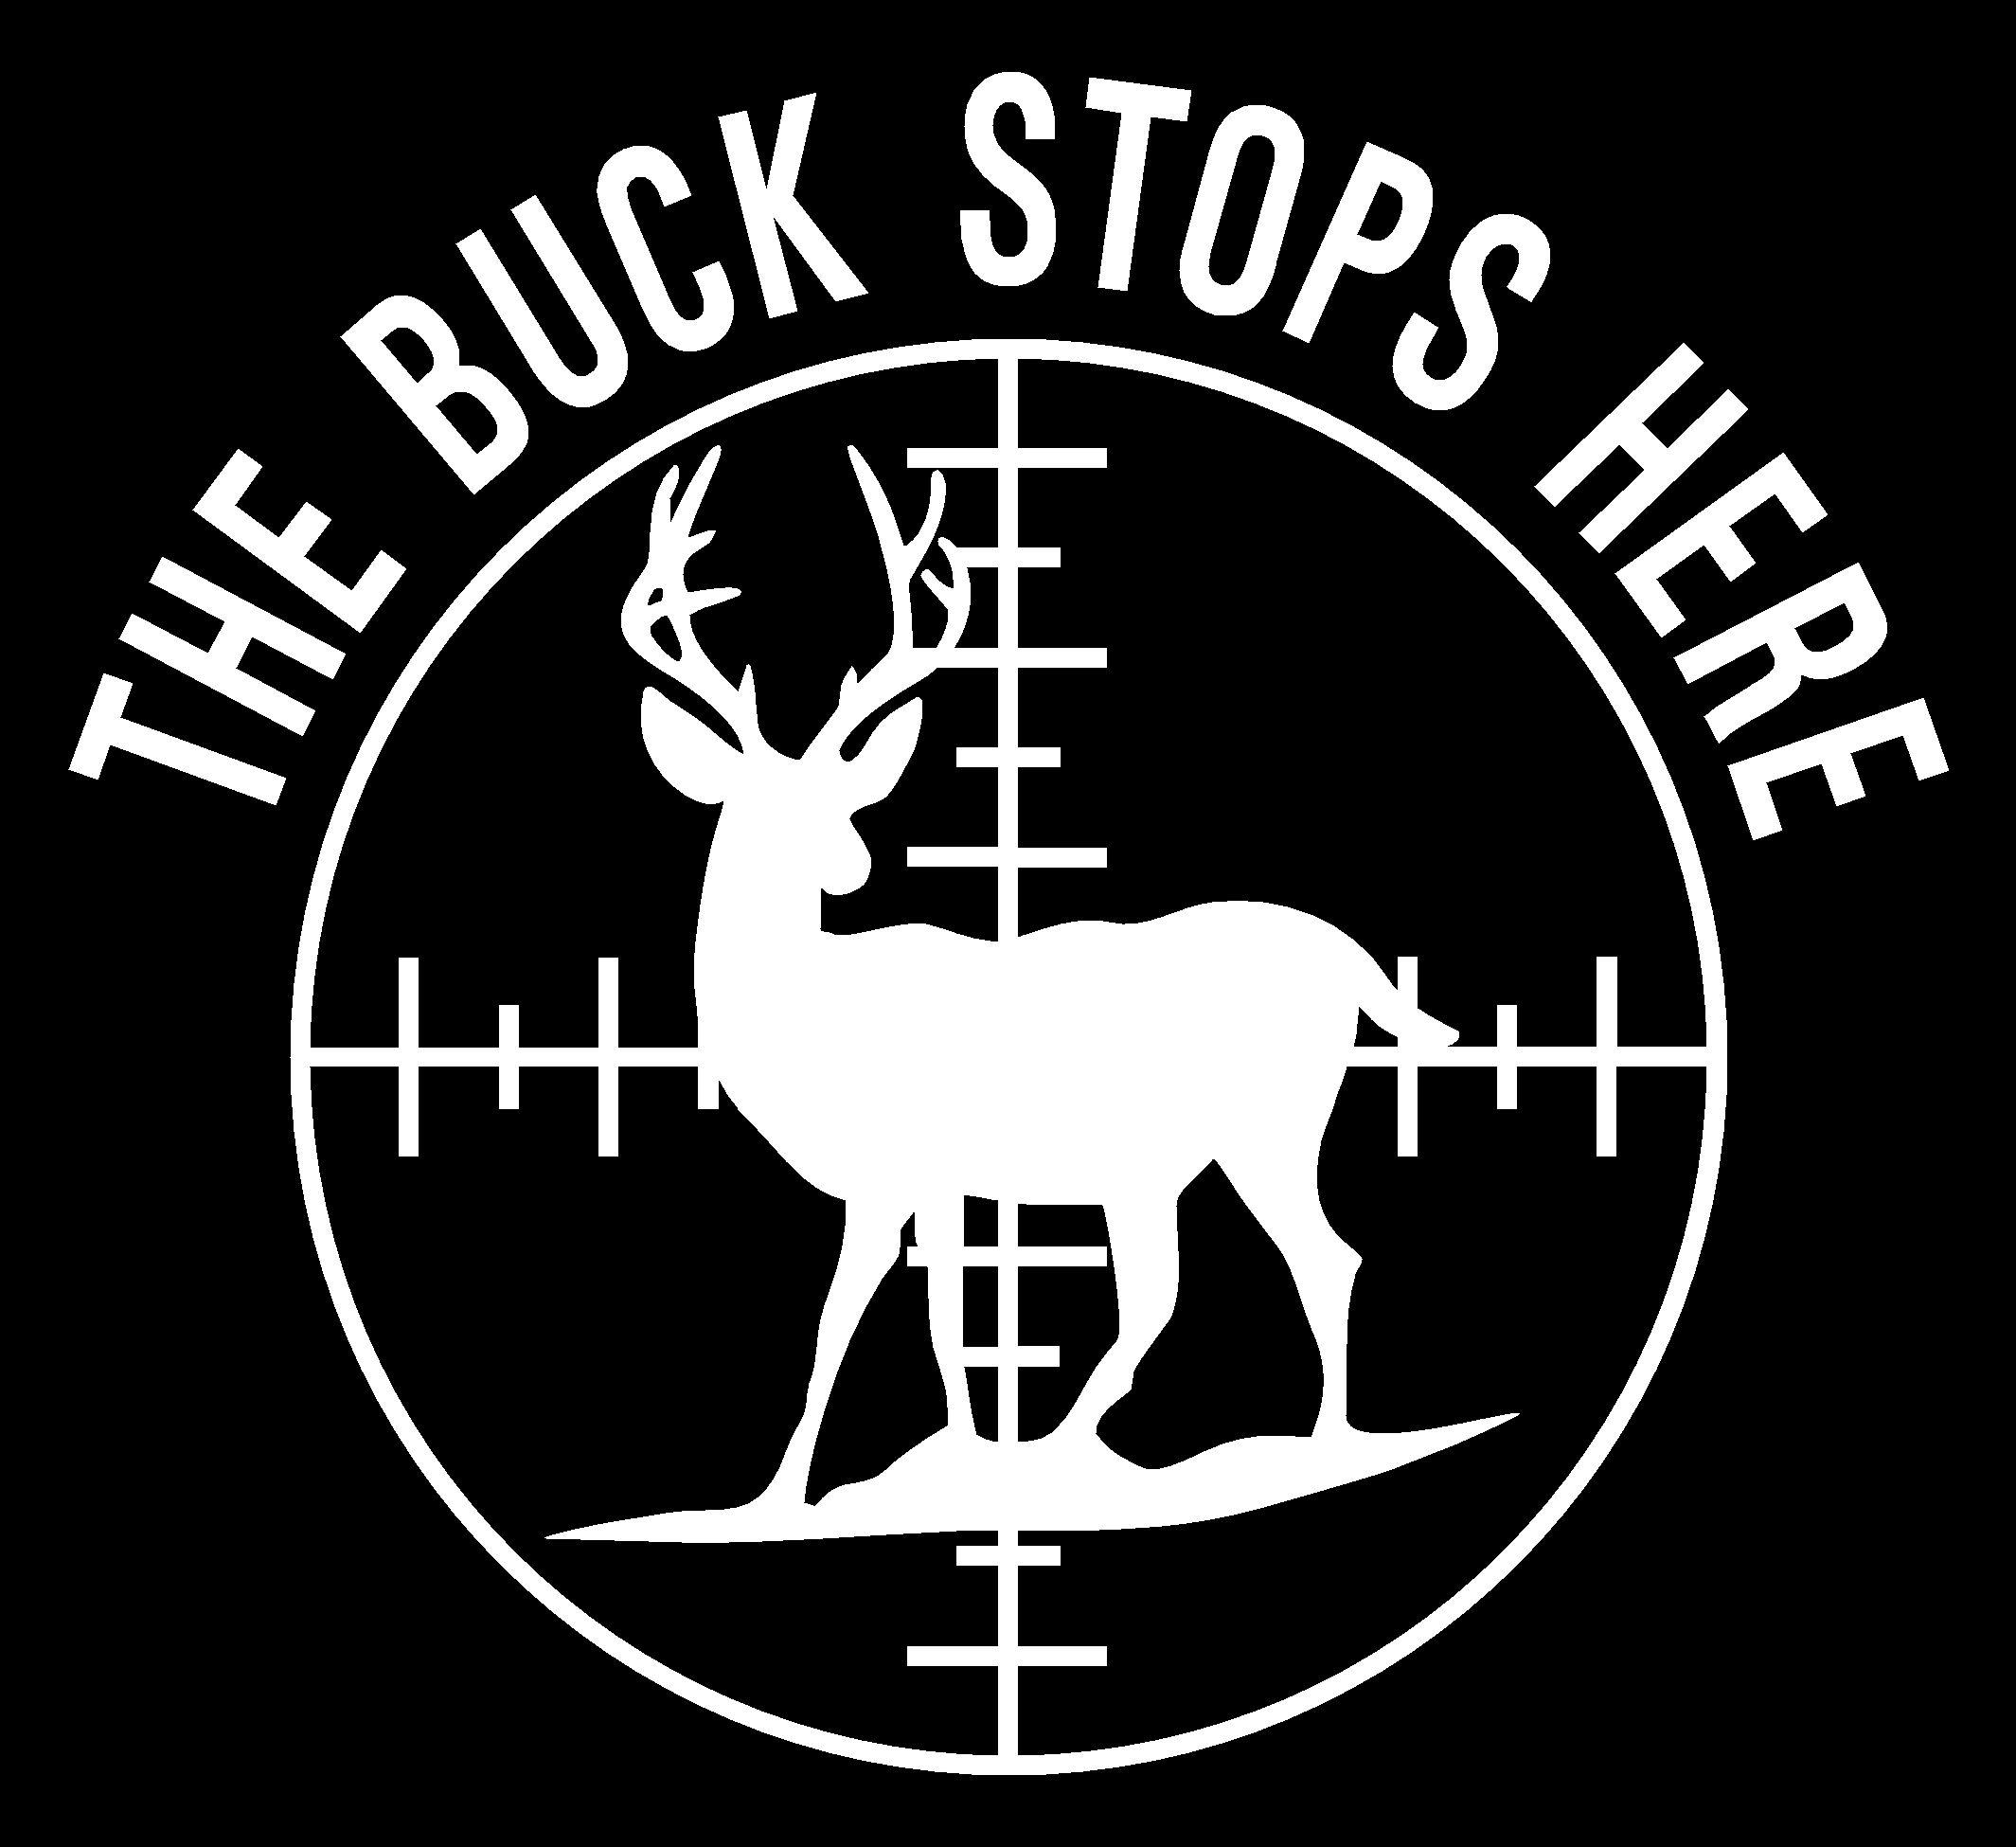 Deer Hunting Logos Home Hunting The Buck Stops